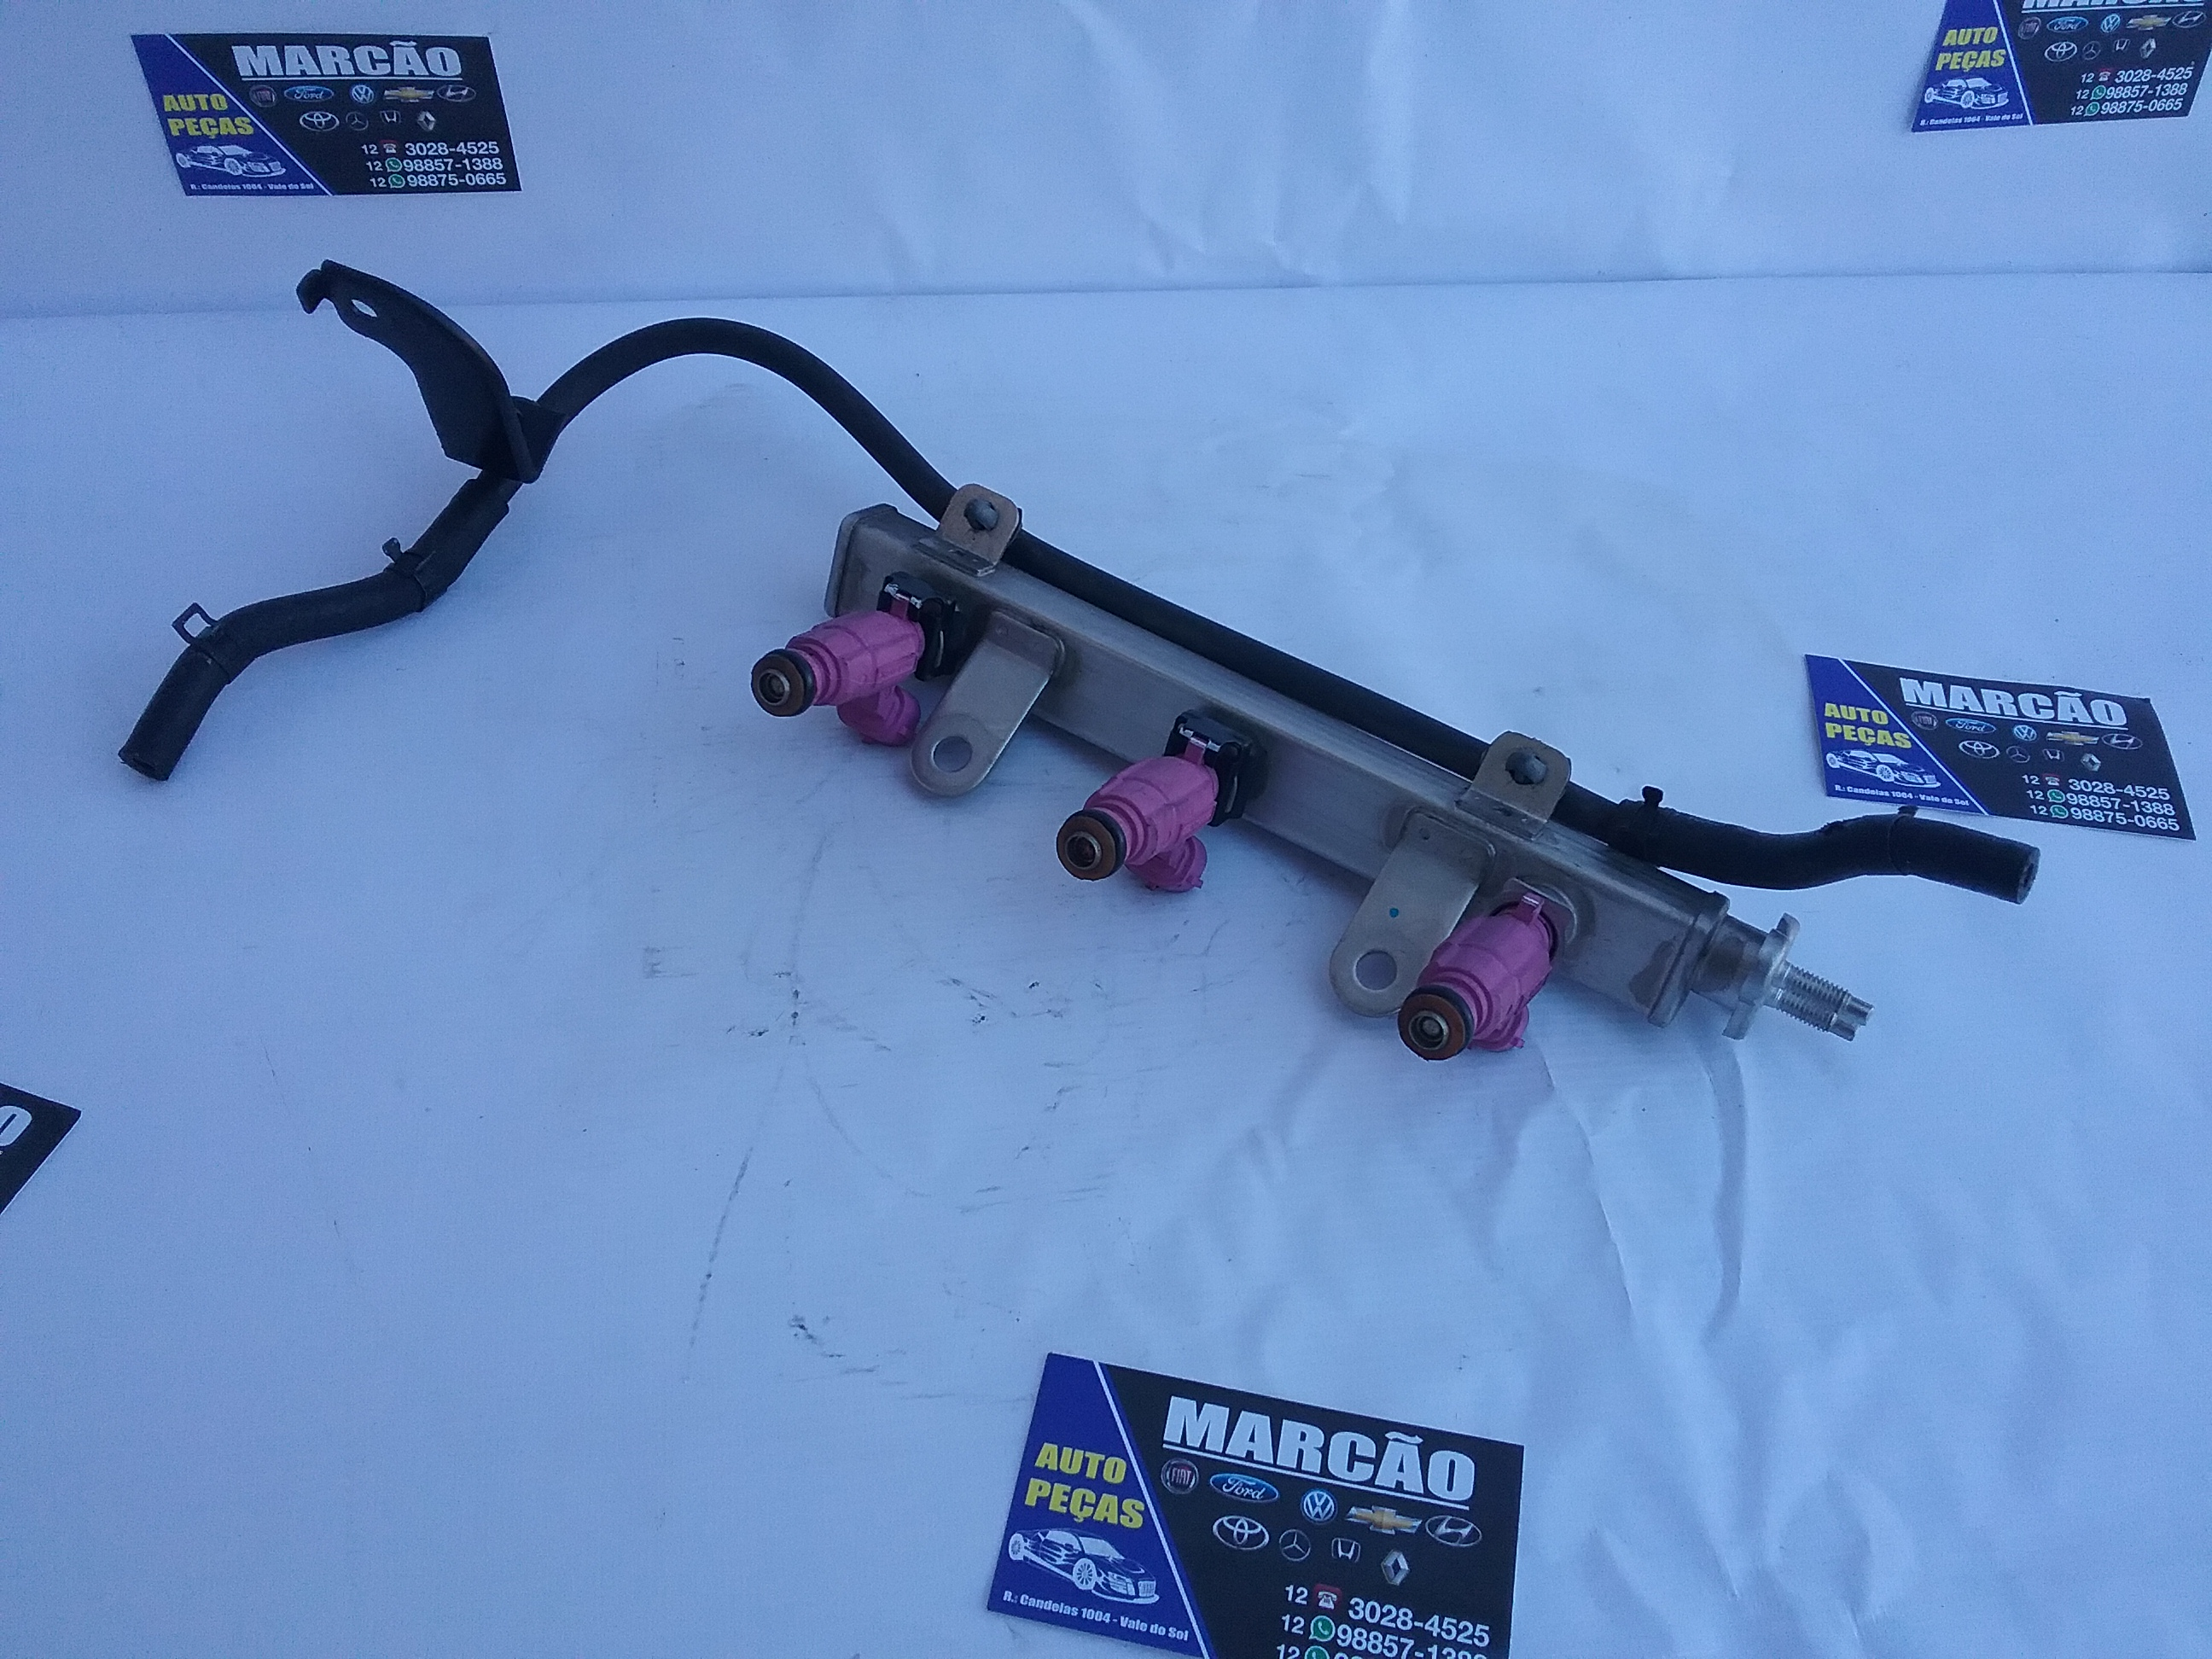 Flauta com bicos injetores HB20 1.0 3 cilindros 2014